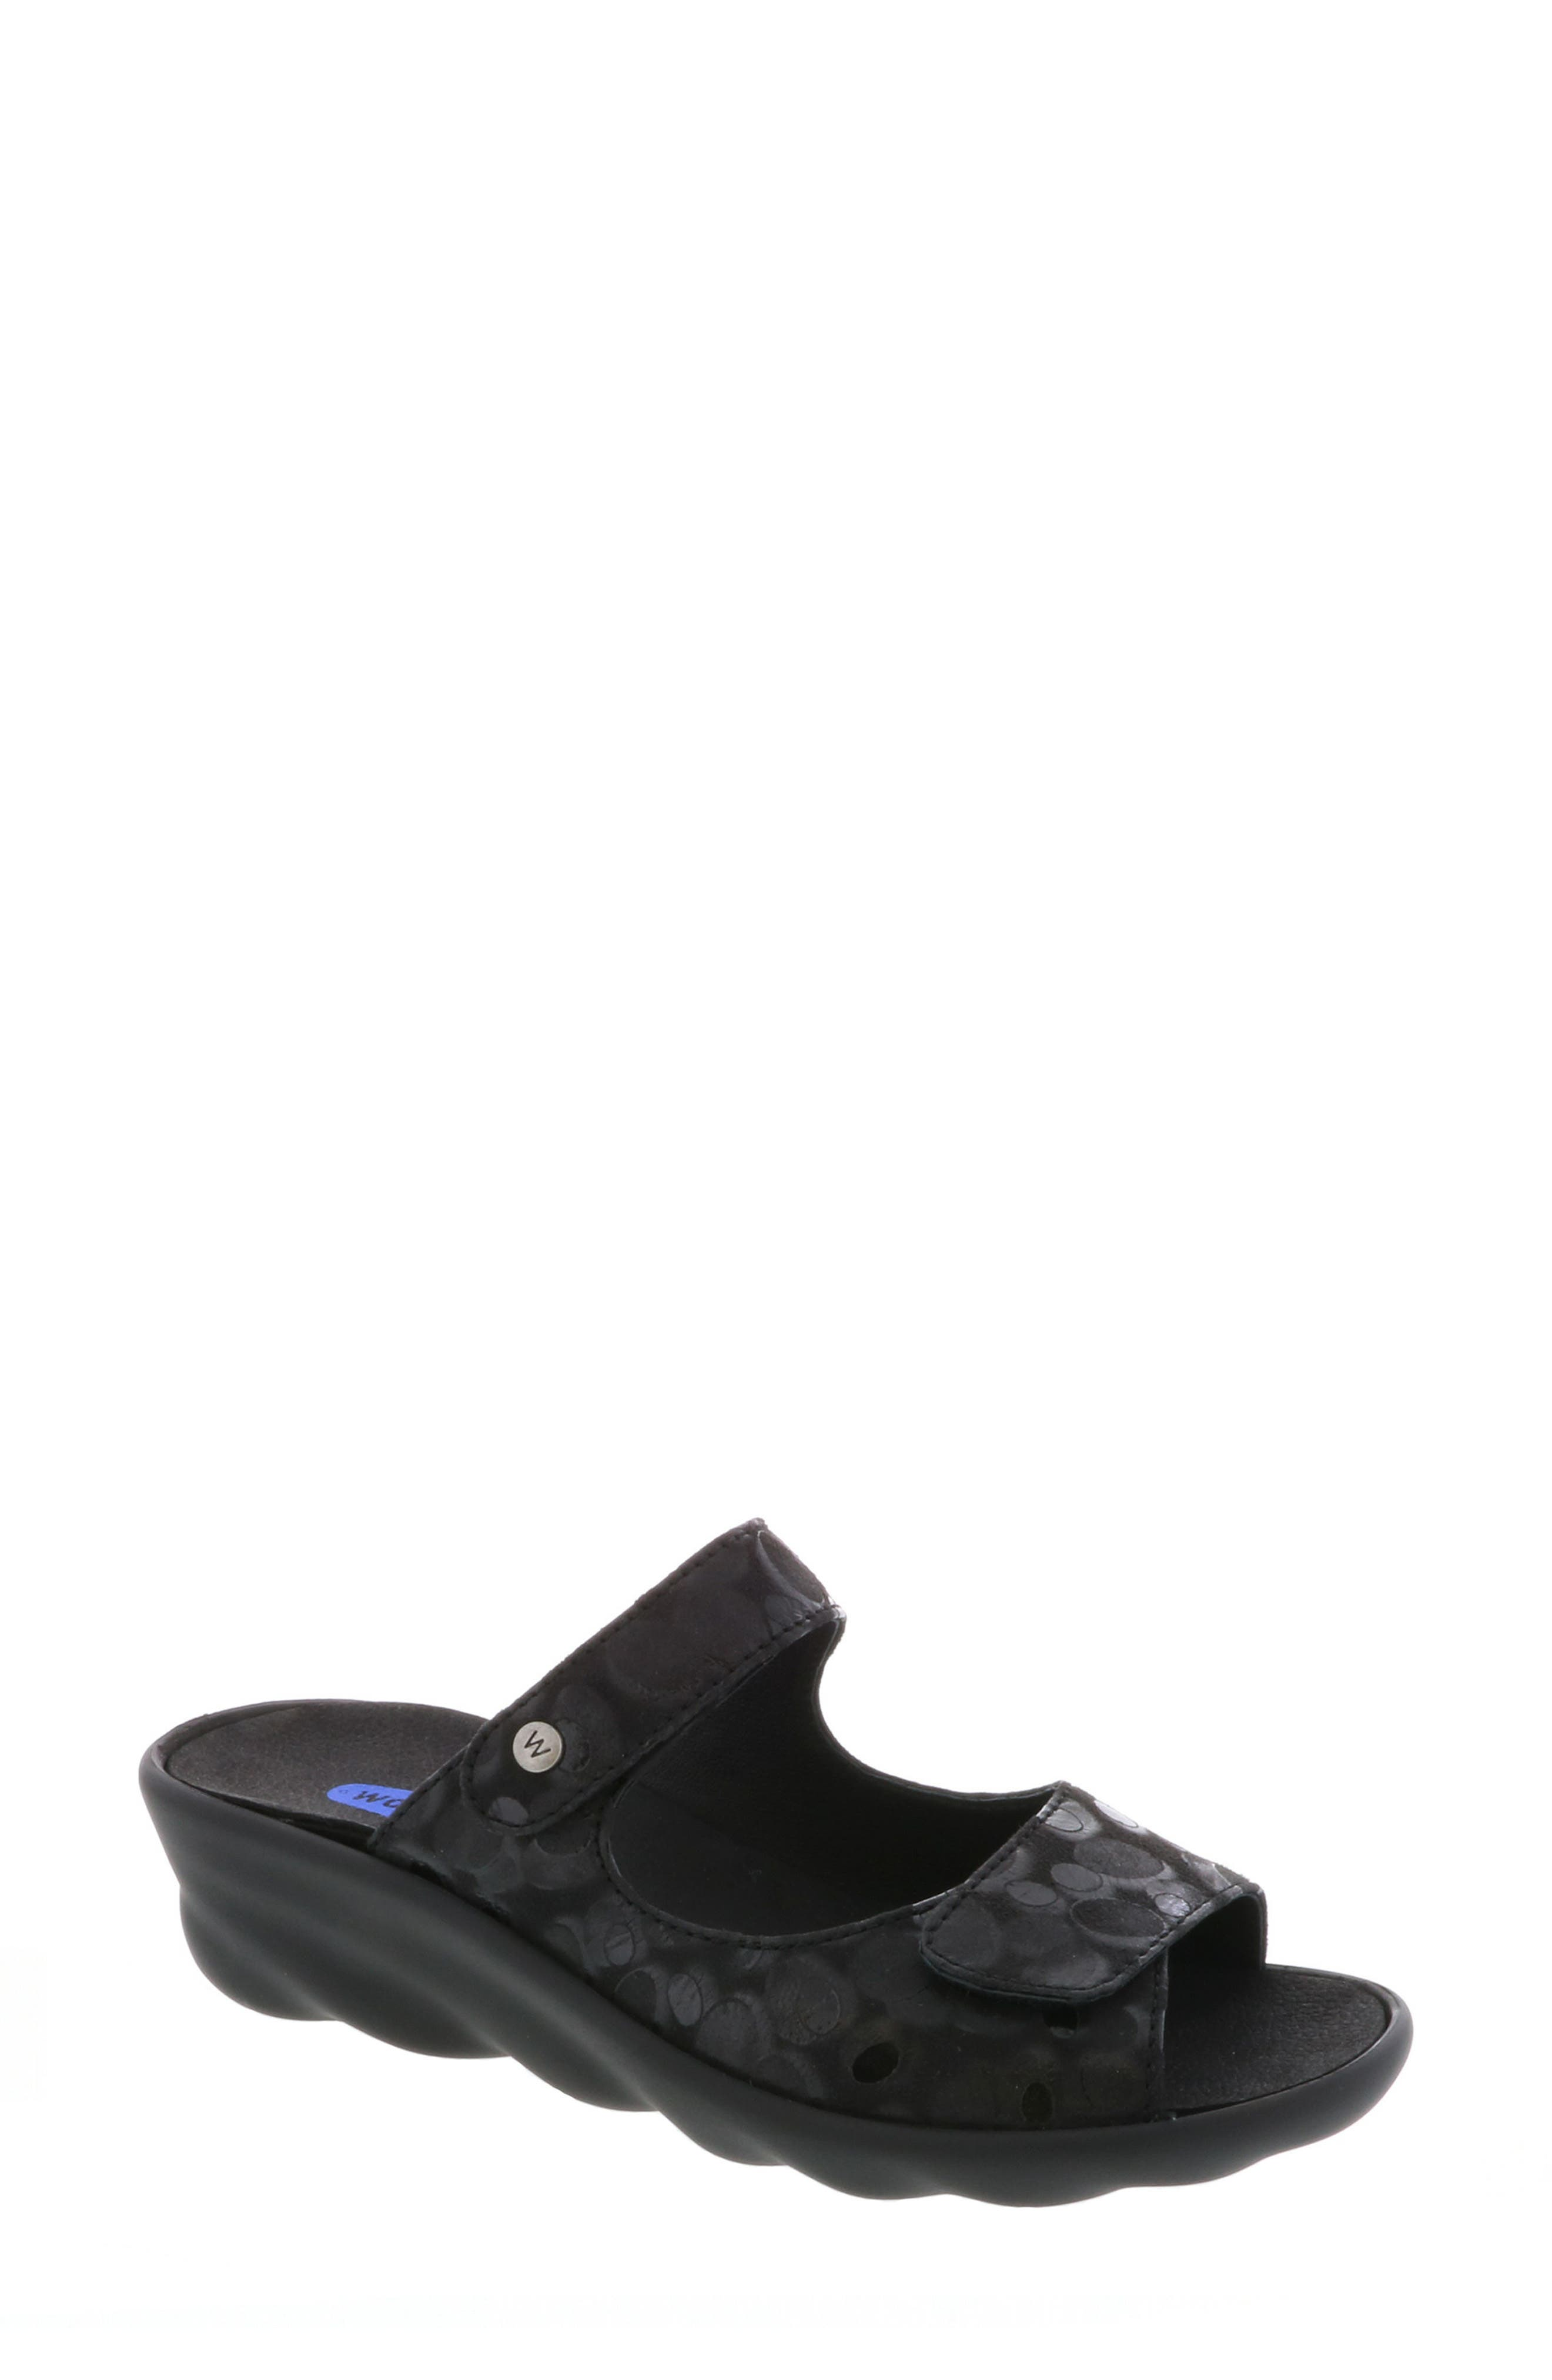 Bolena Slide Sandal,                         Main,                         color, BLACK CIRCLE PRINT